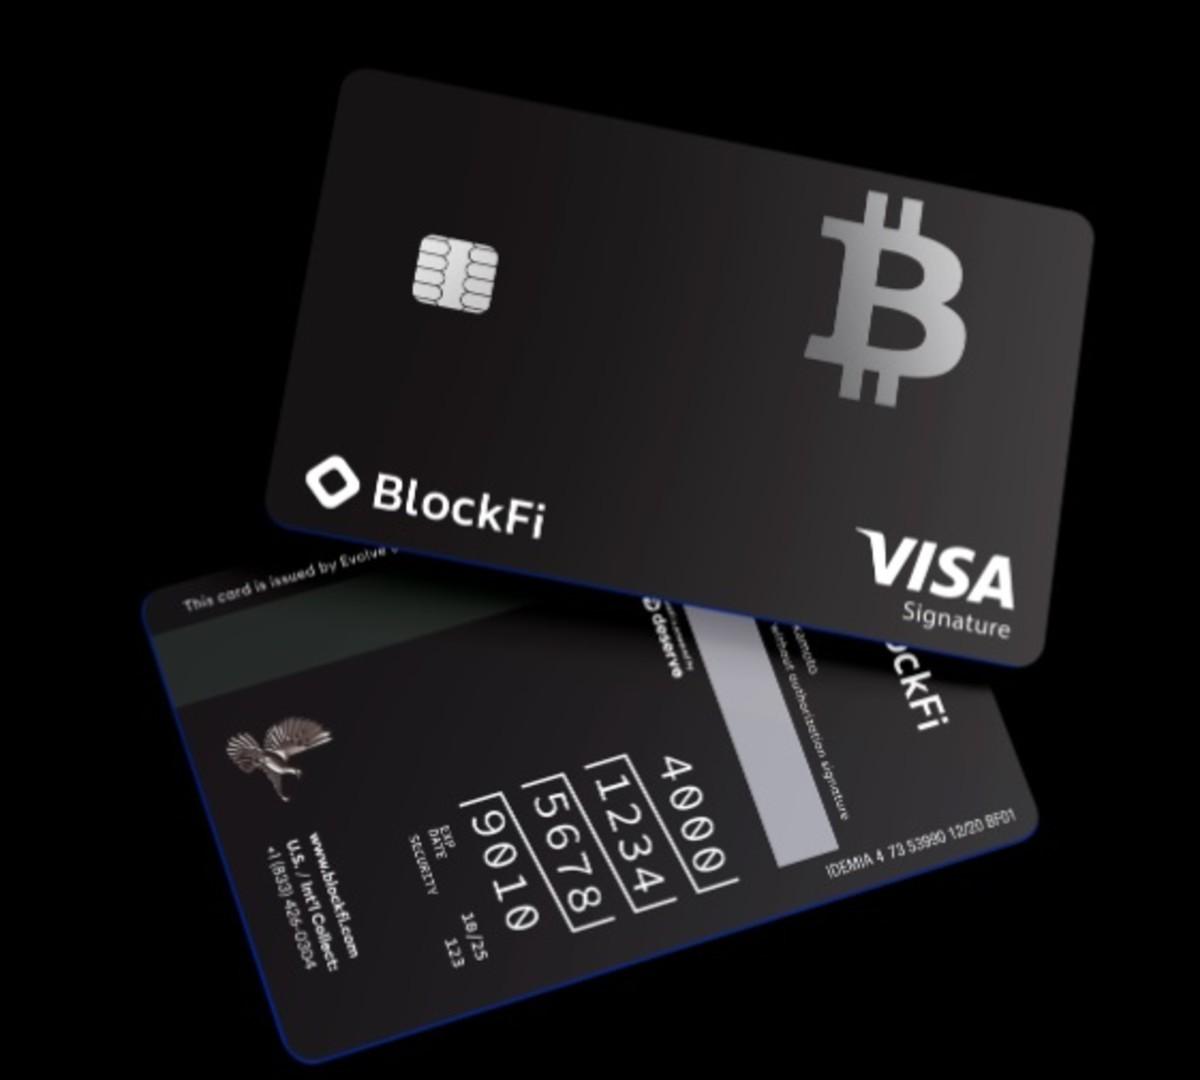 BlockFi launches Visa credit card with bitcoin cashback